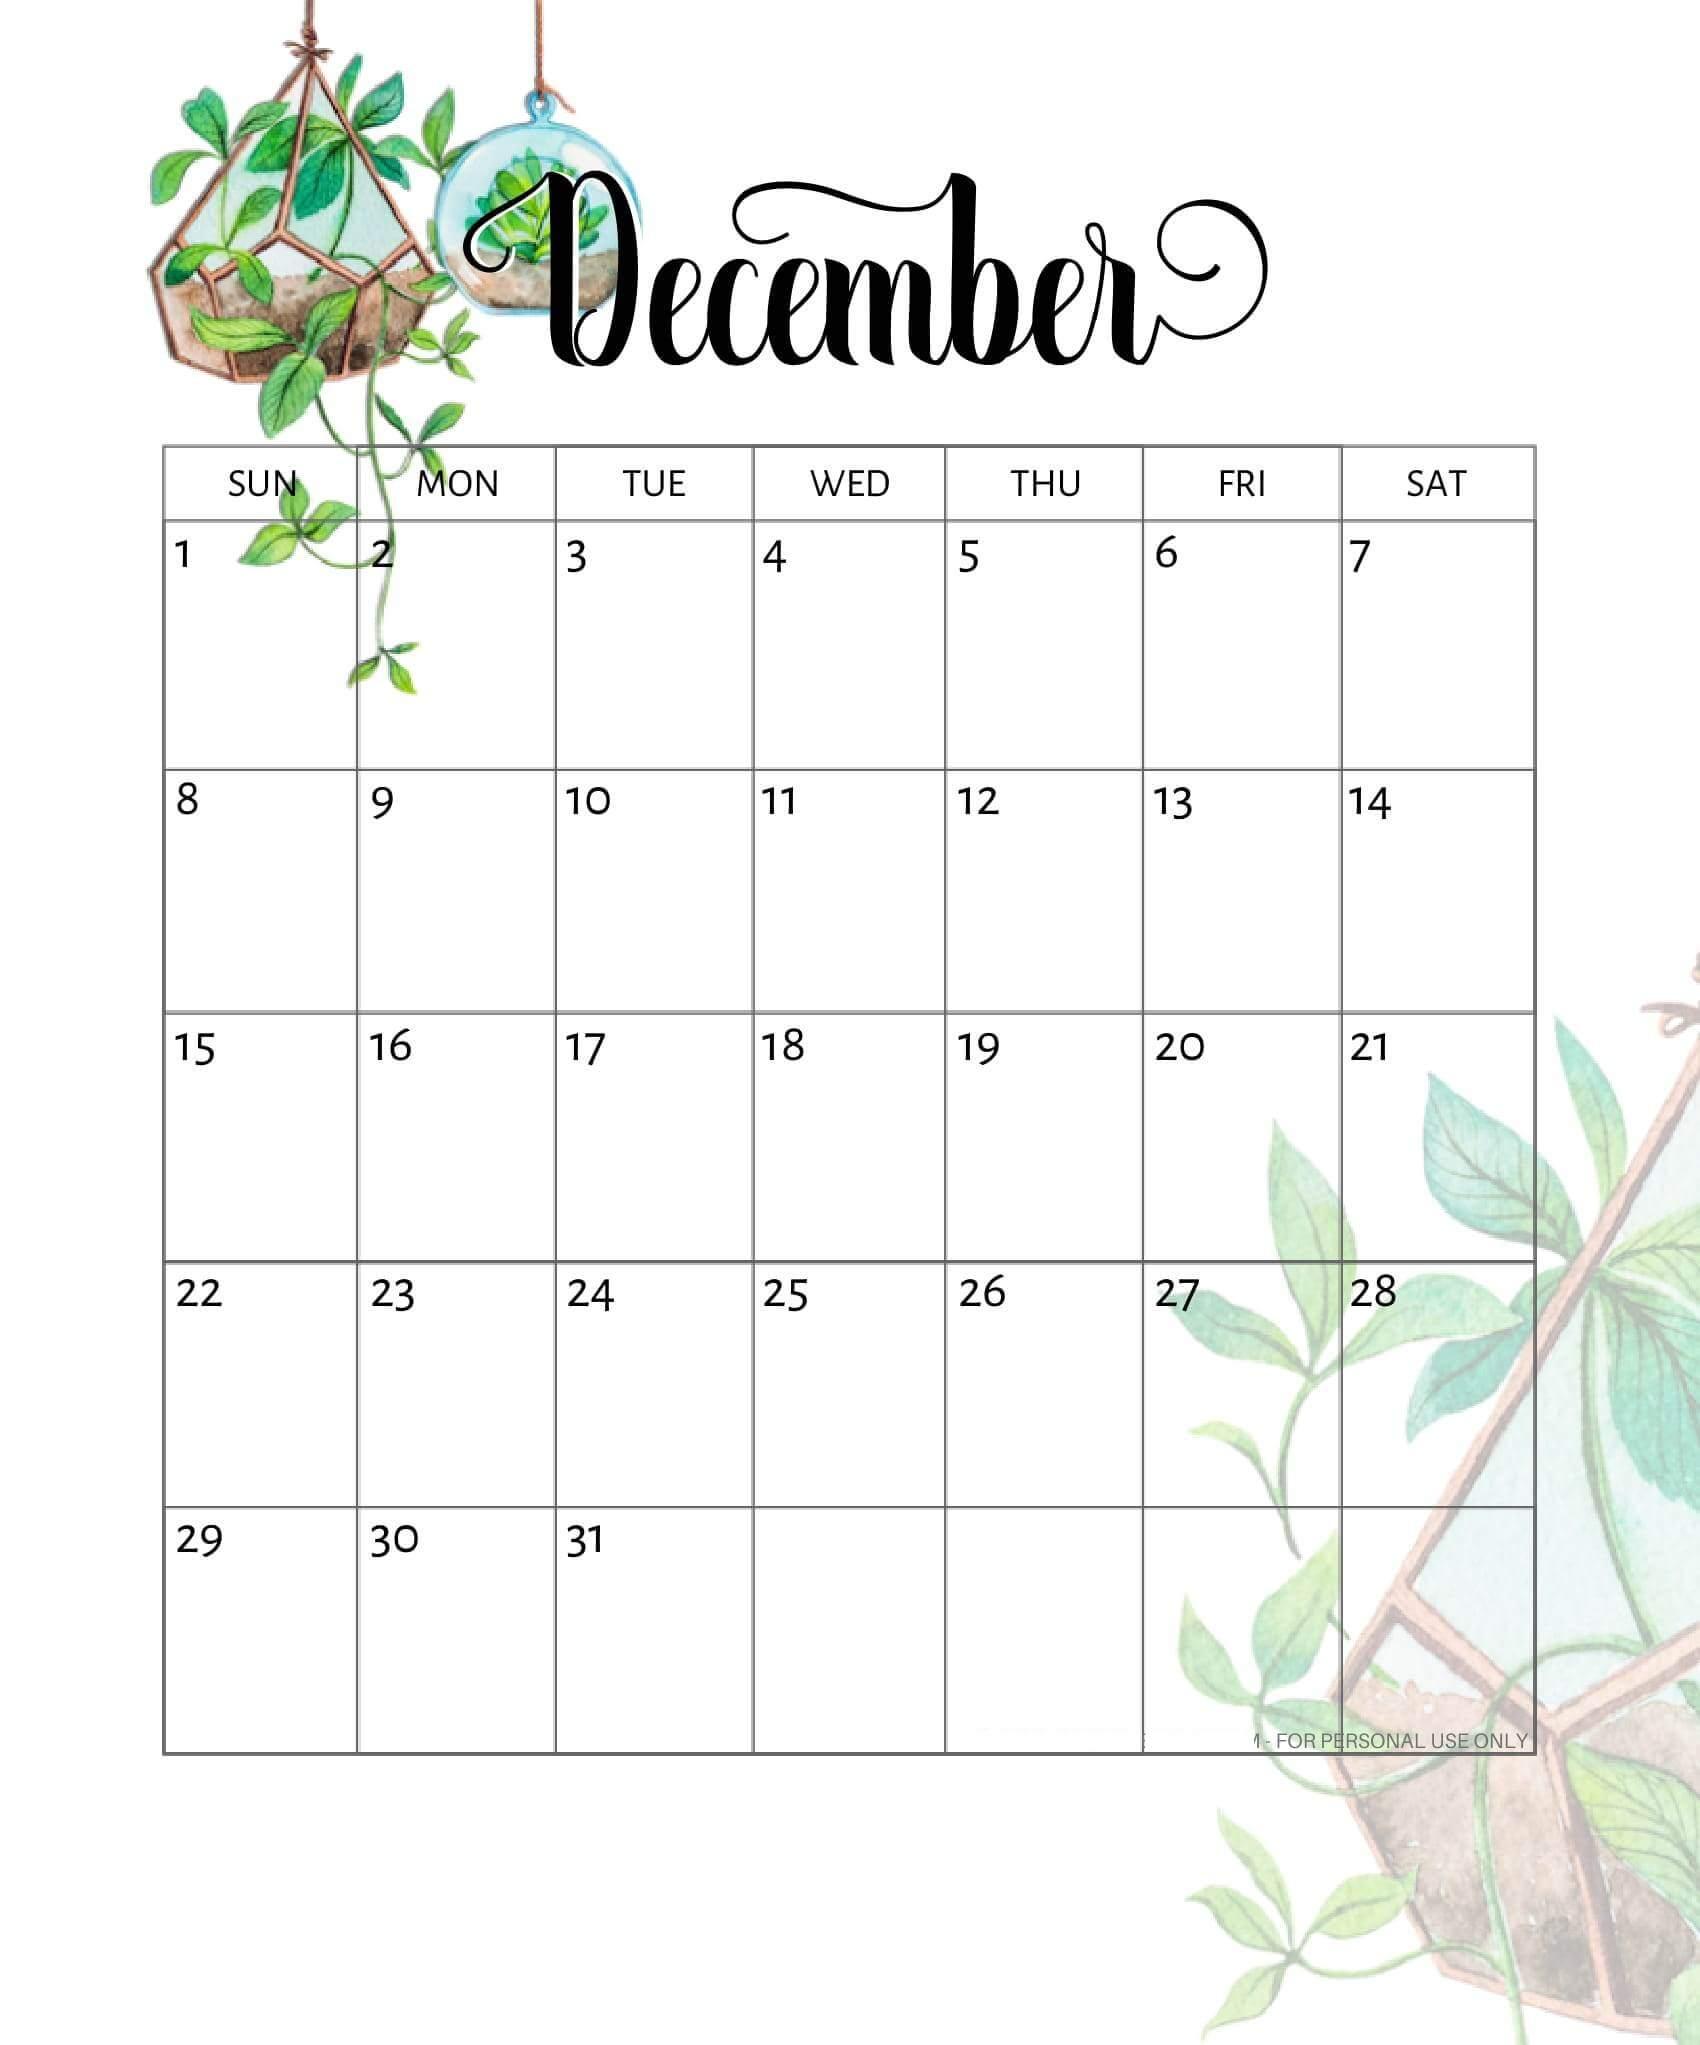 Cute December 2019 Calendar Colorful Design | Free Printable